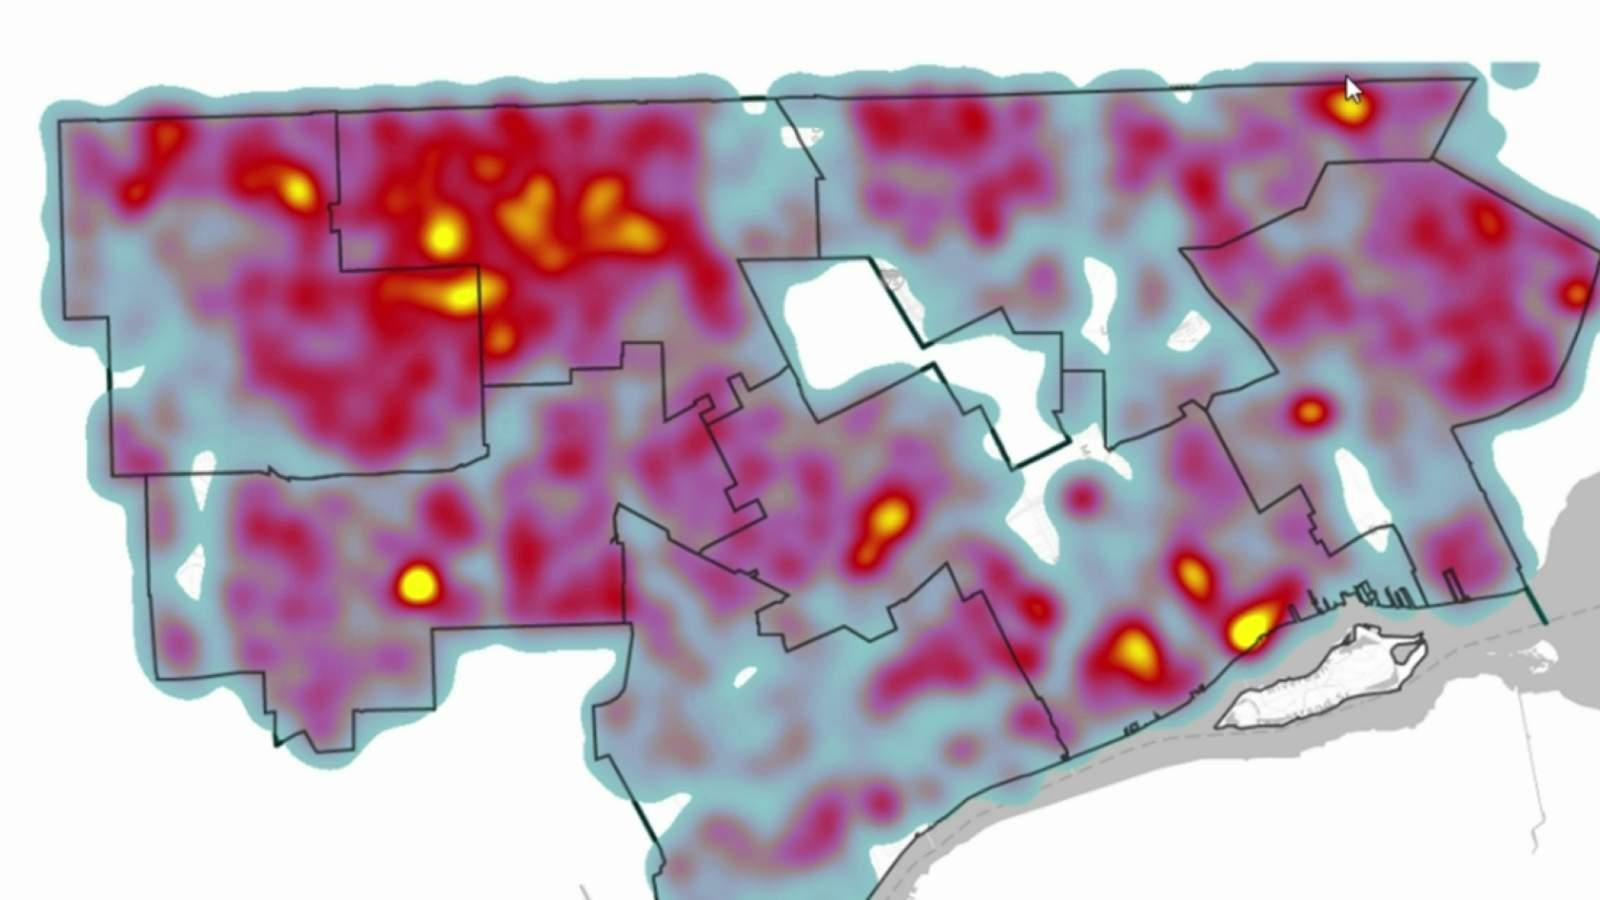 Heat map reveals Detroit neighborhoods hardest hit by coronavirus (COVID-19)